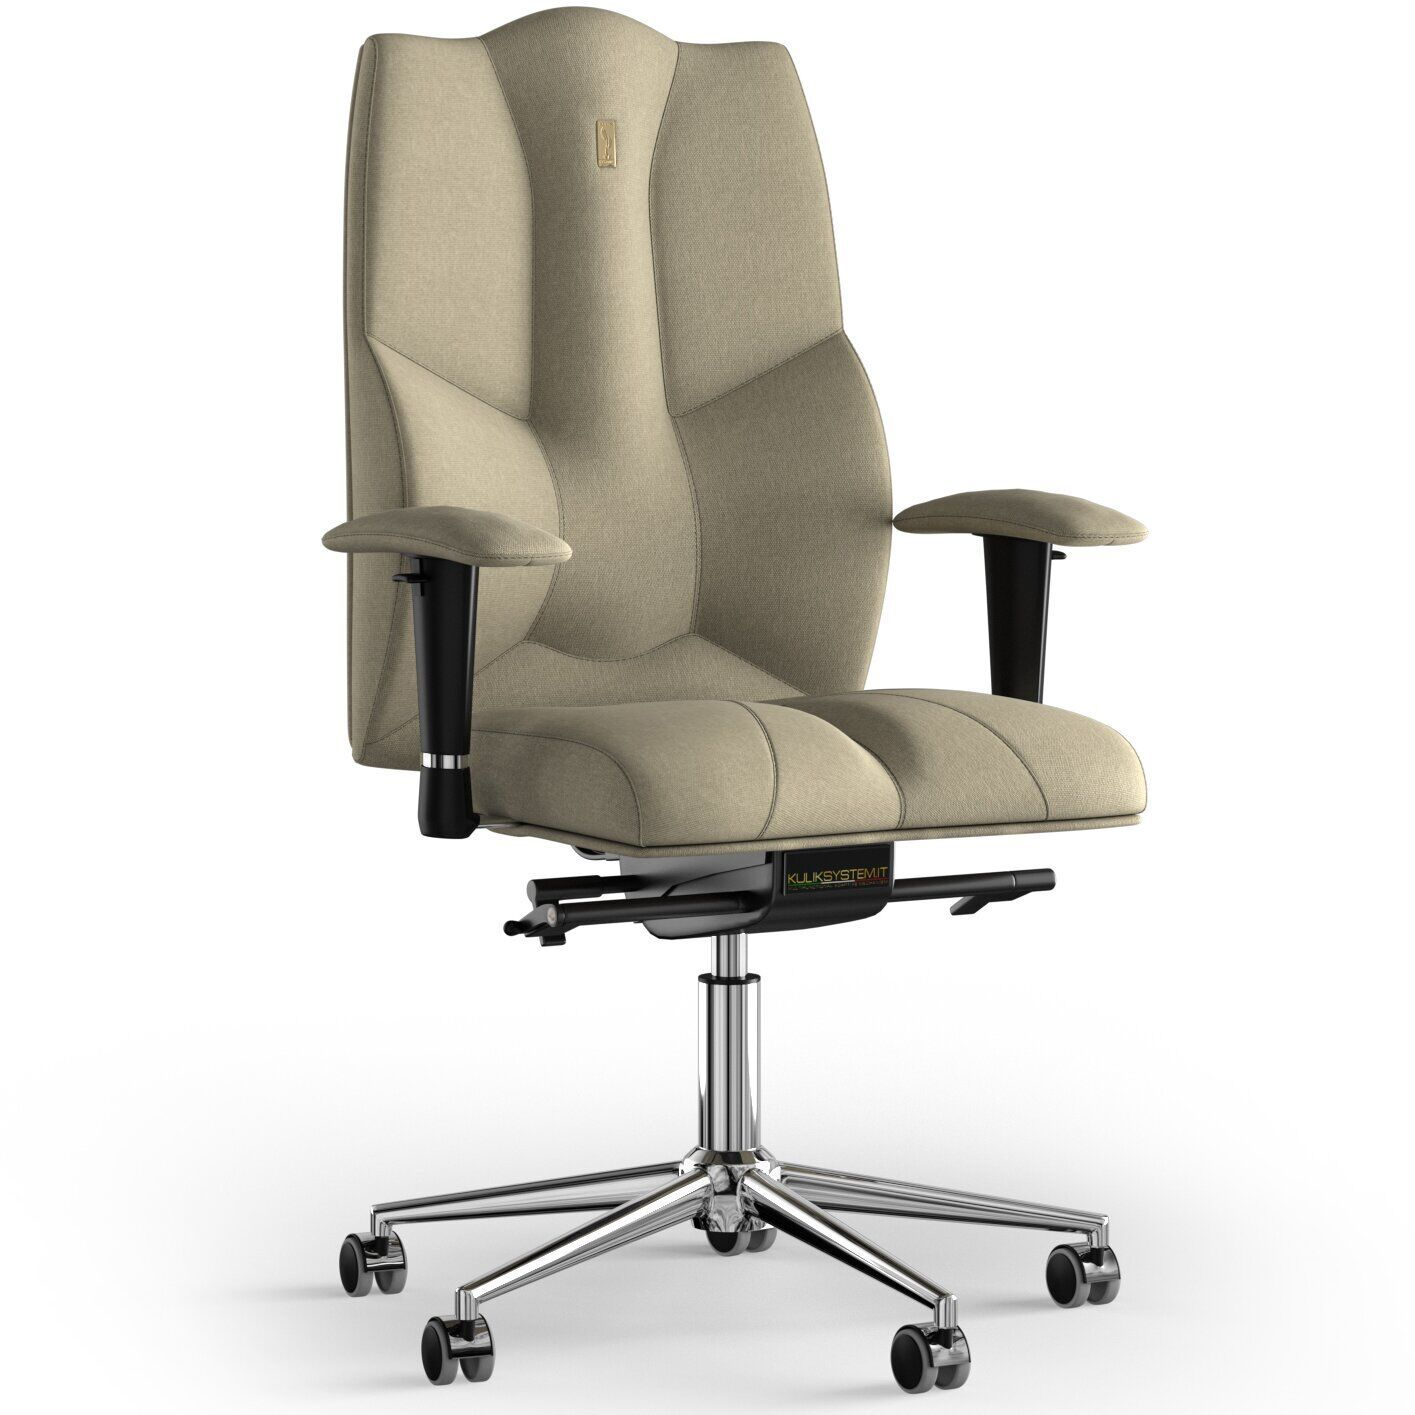 Кресло KULIK SYSTEM BUSINESS Ткань без подголовника без строчки